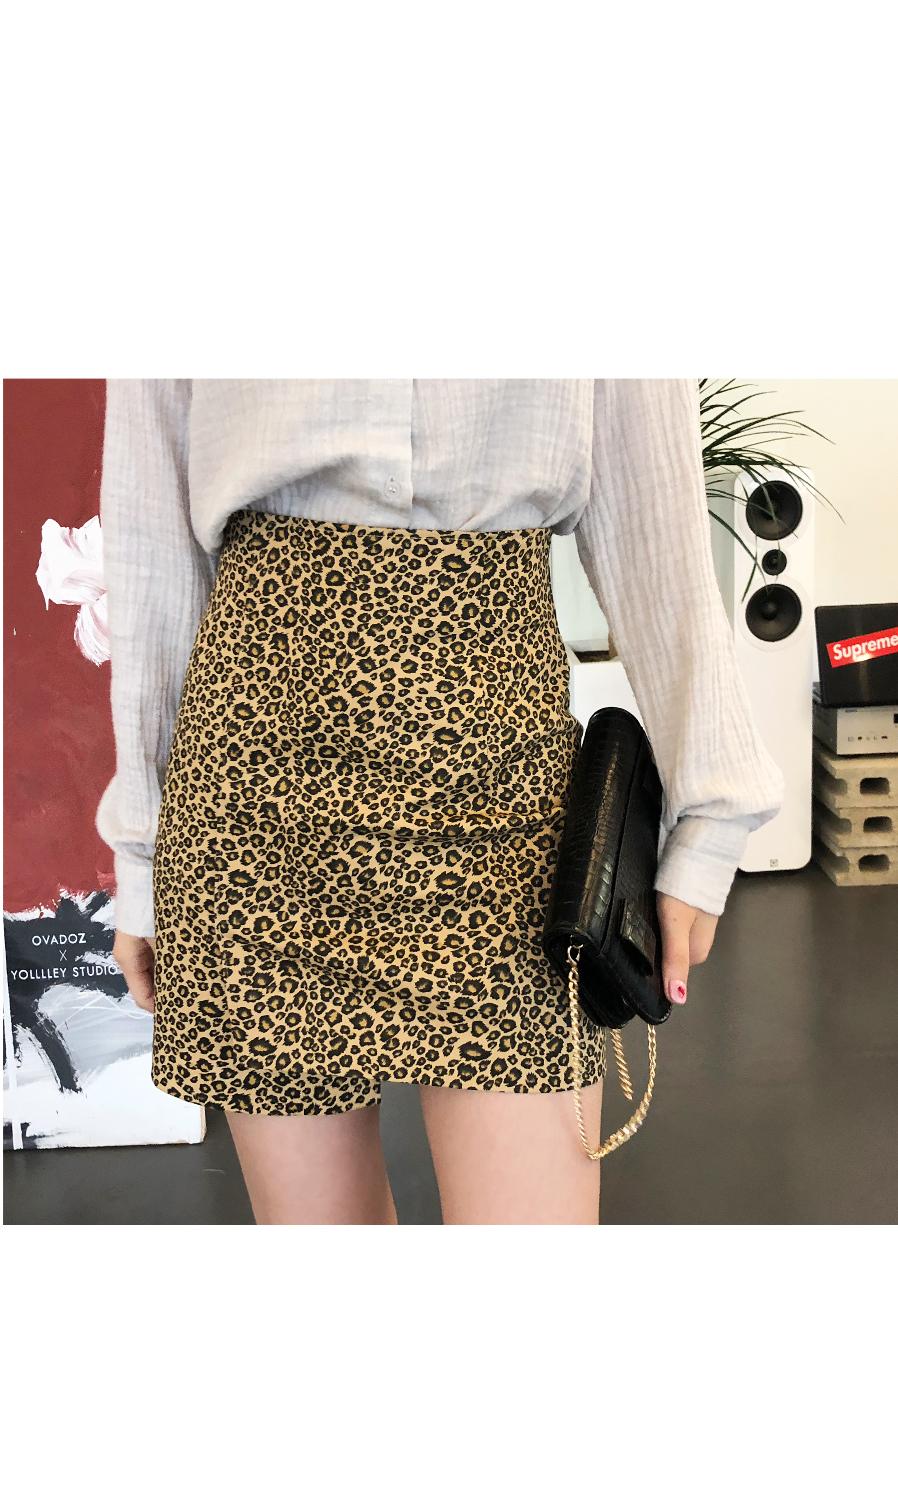 Leopard point skirt